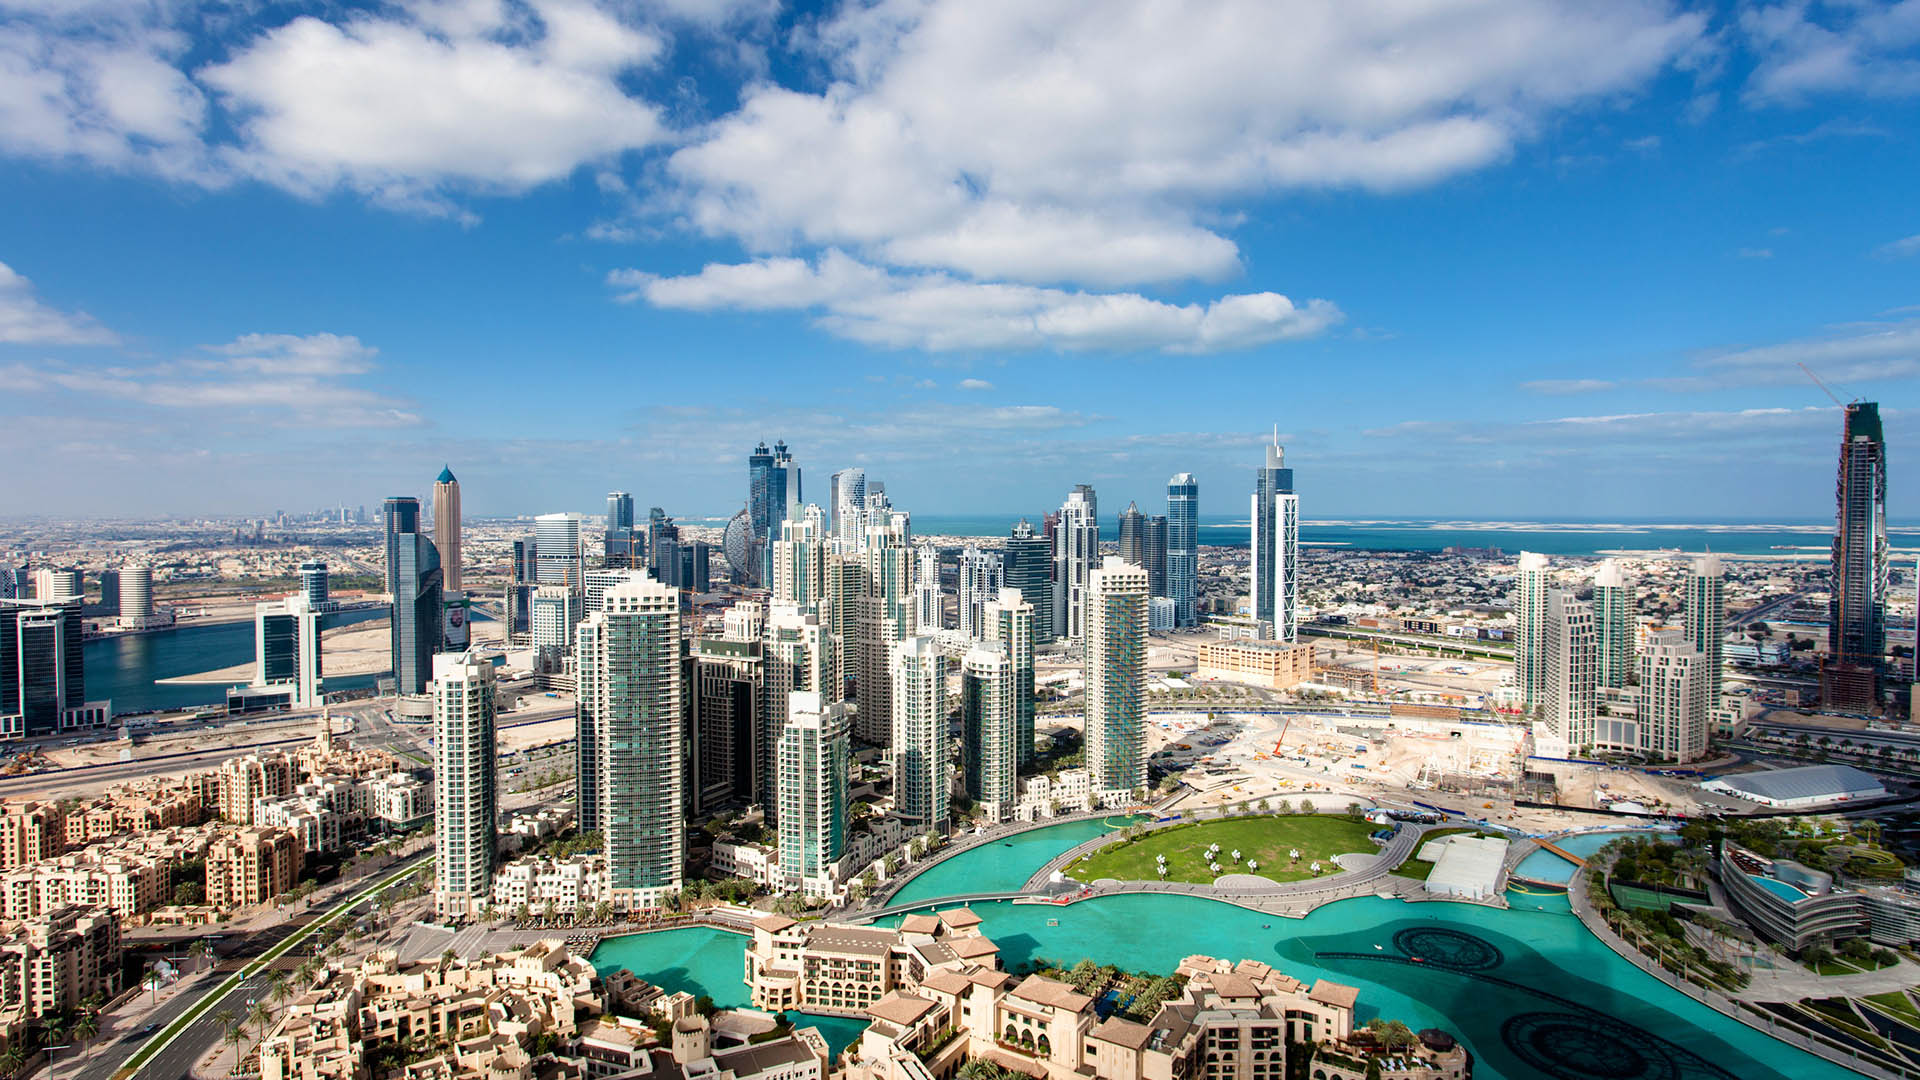 Downtown Dubai - 8